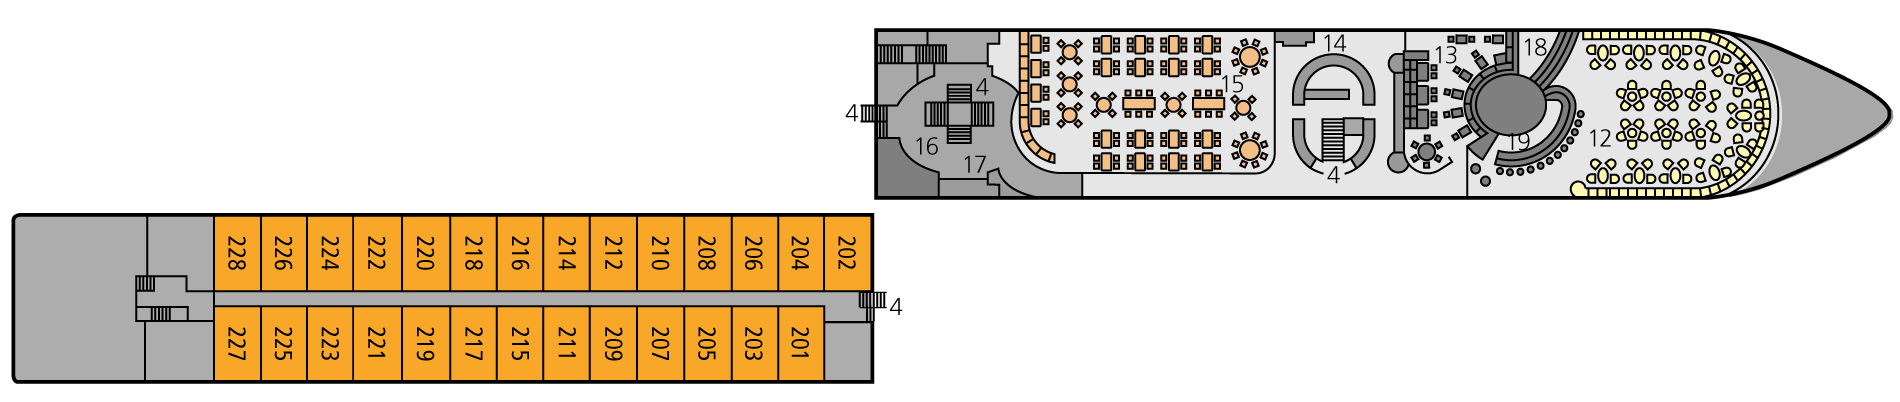 A-ROSA STELLA Deck 2